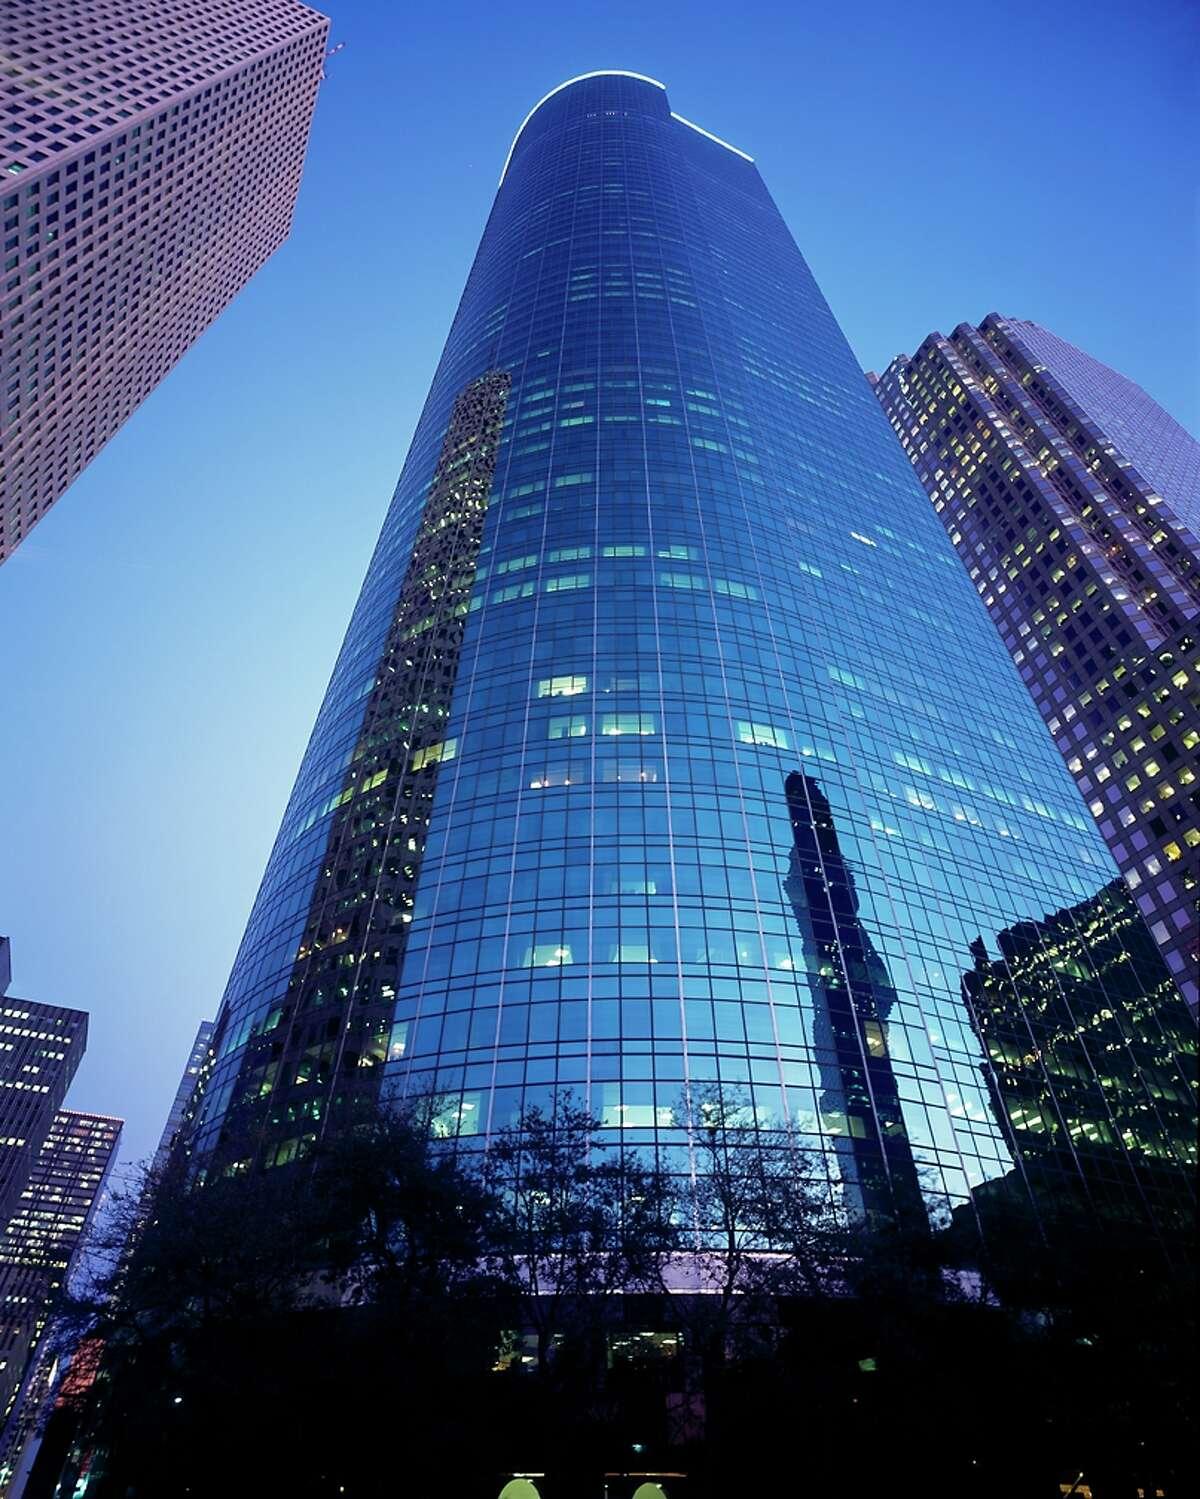 Wells Fargo Plaza in Houston: 992 feet, 72 stories